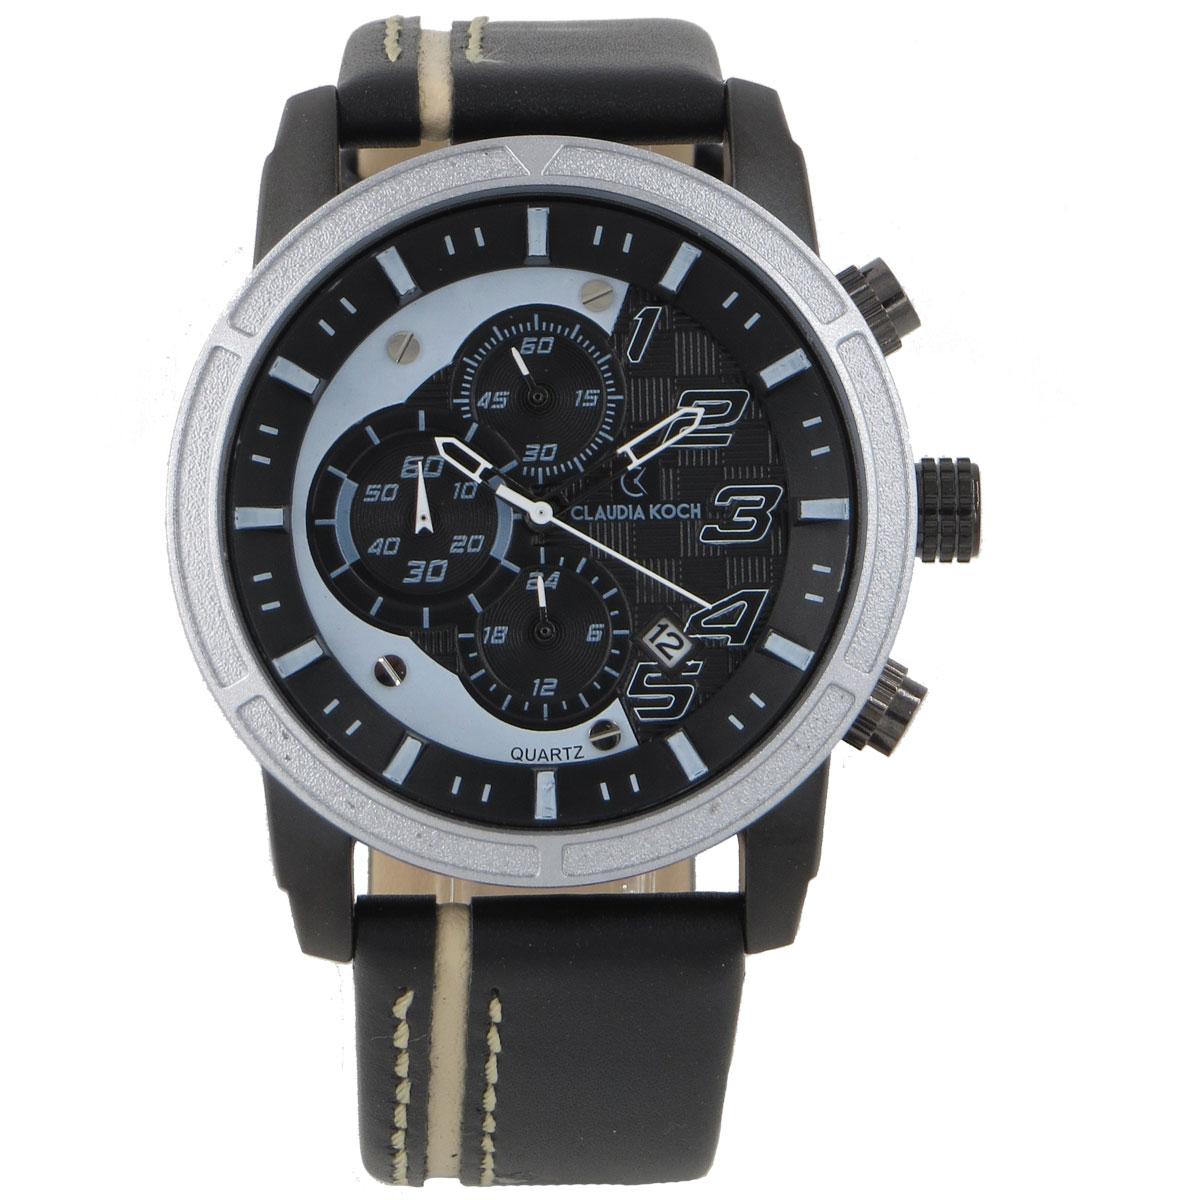 Claudia-Koch-Watches-Men-CK-1003-SBK